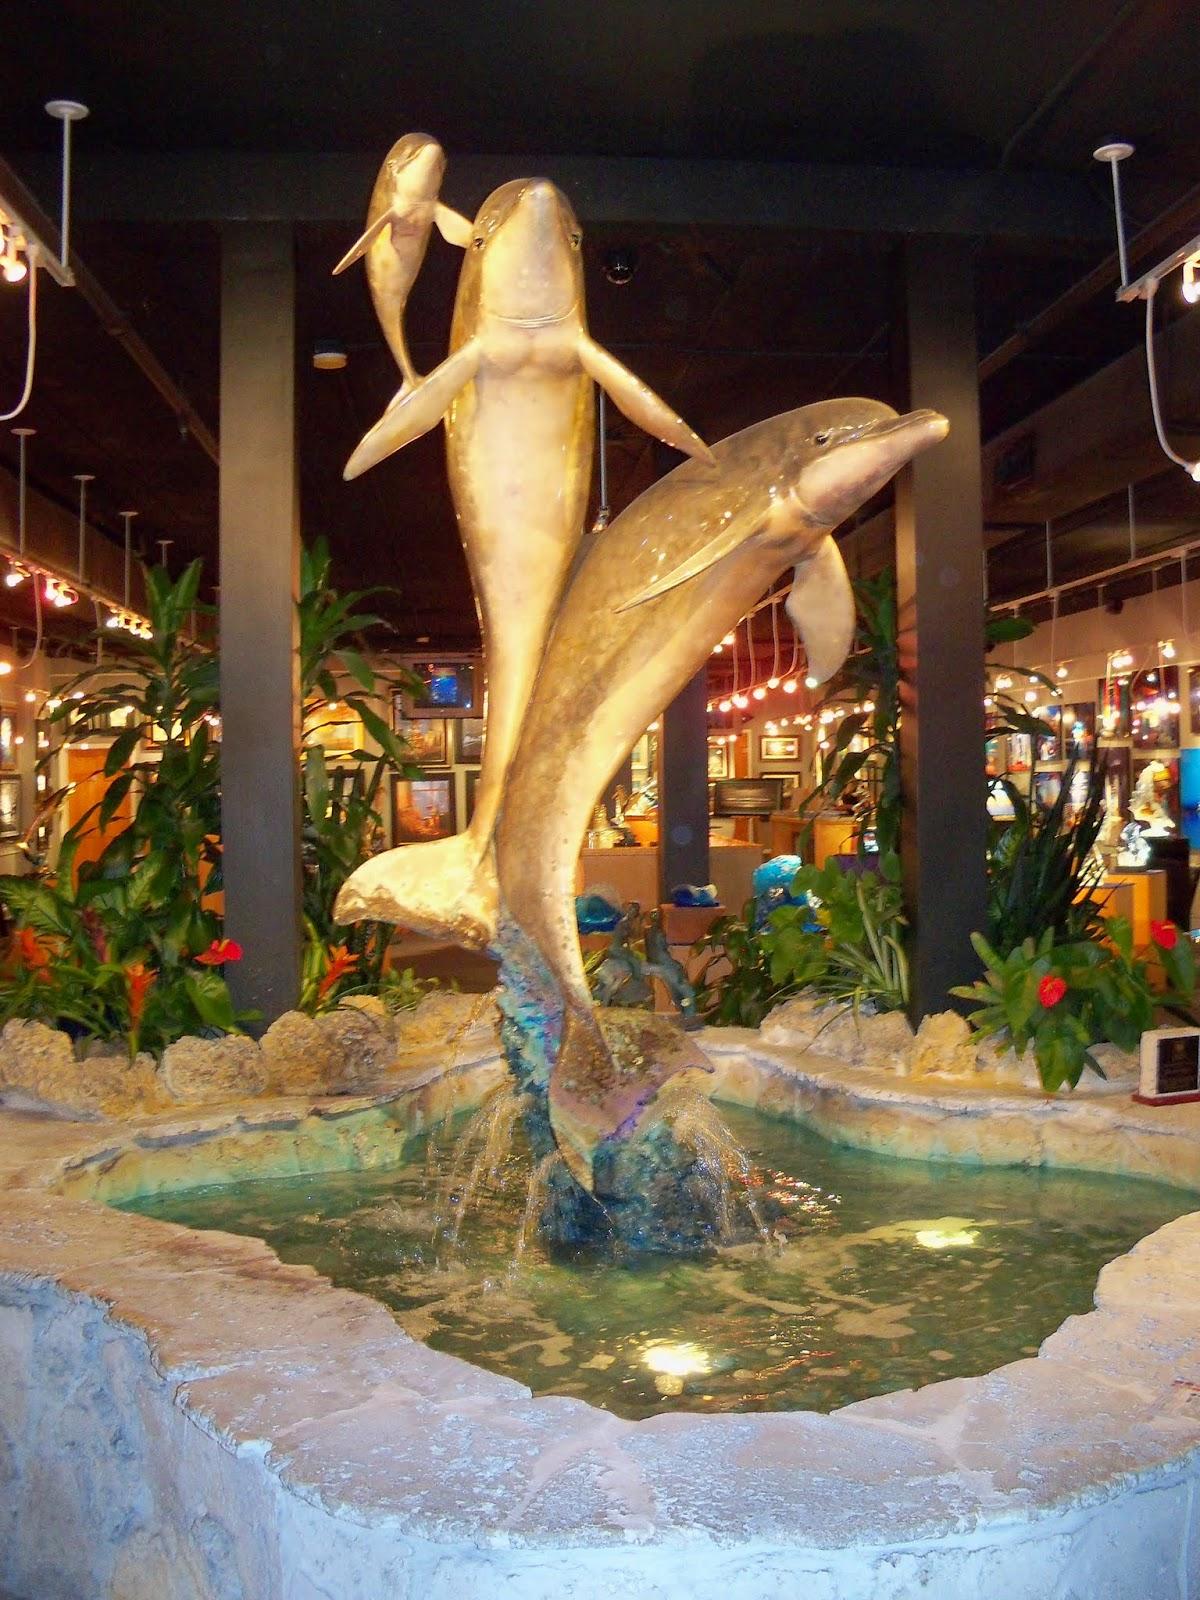 Key West Vacation - 116_5351.JPG